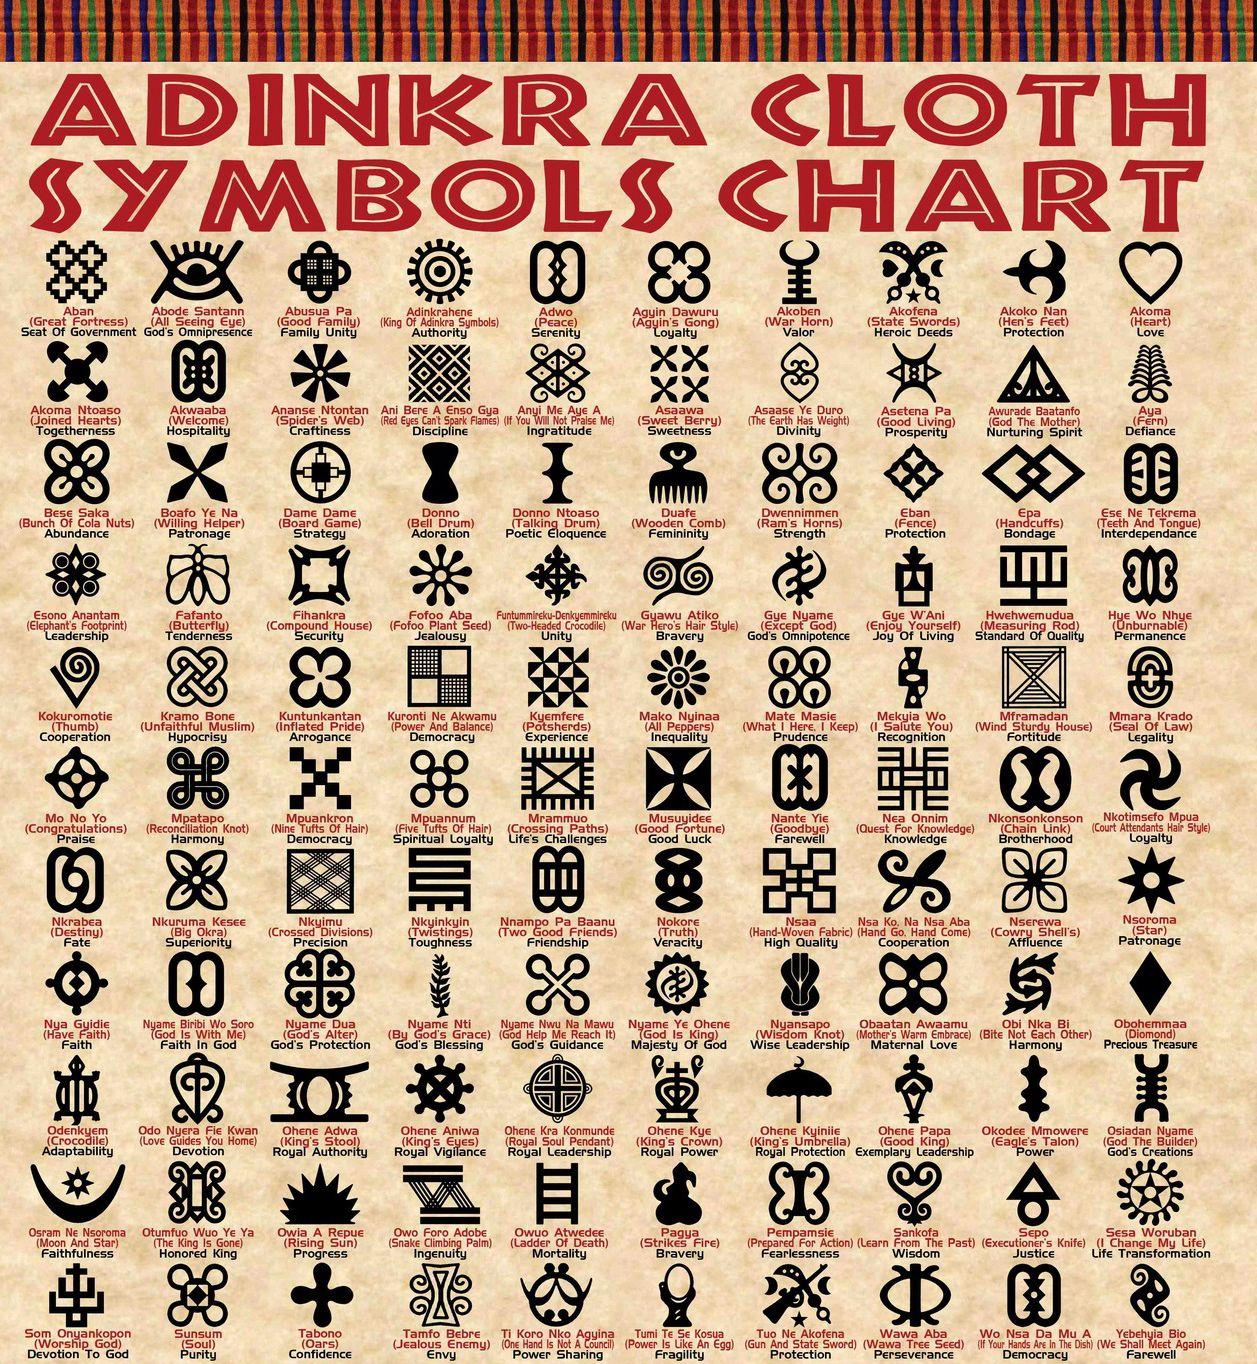 Mckinley 6th Grade Drama Class African Storytelling Adinkra Symbols